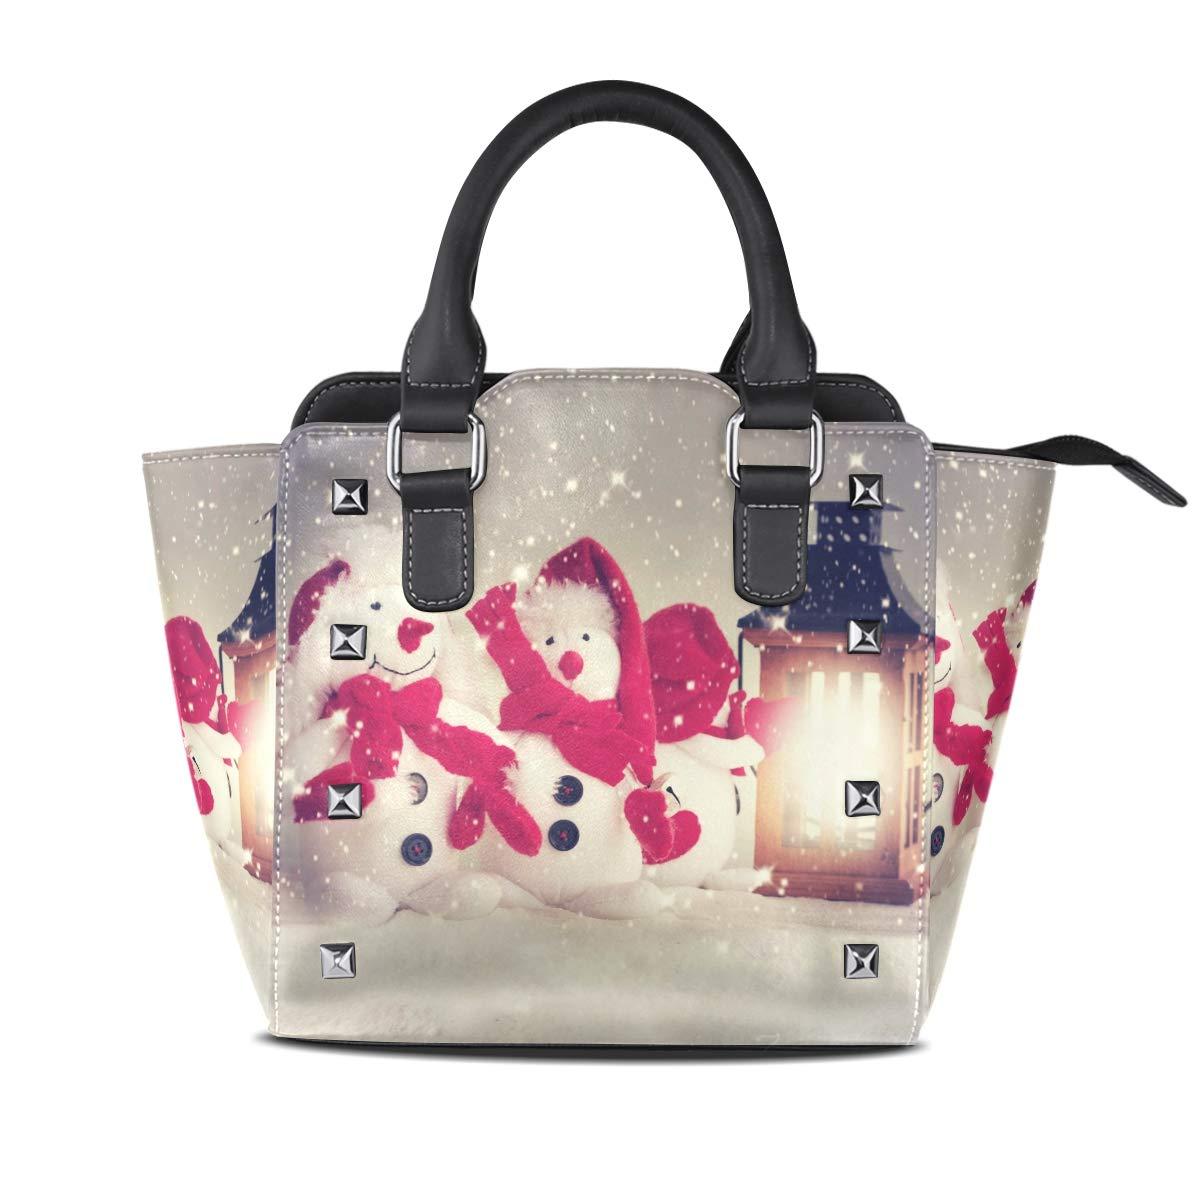 Design5 Handbag Beautiful Butterfly Genuine Leather Tote Rivet Bag Shoulder Strap Top Handle Women